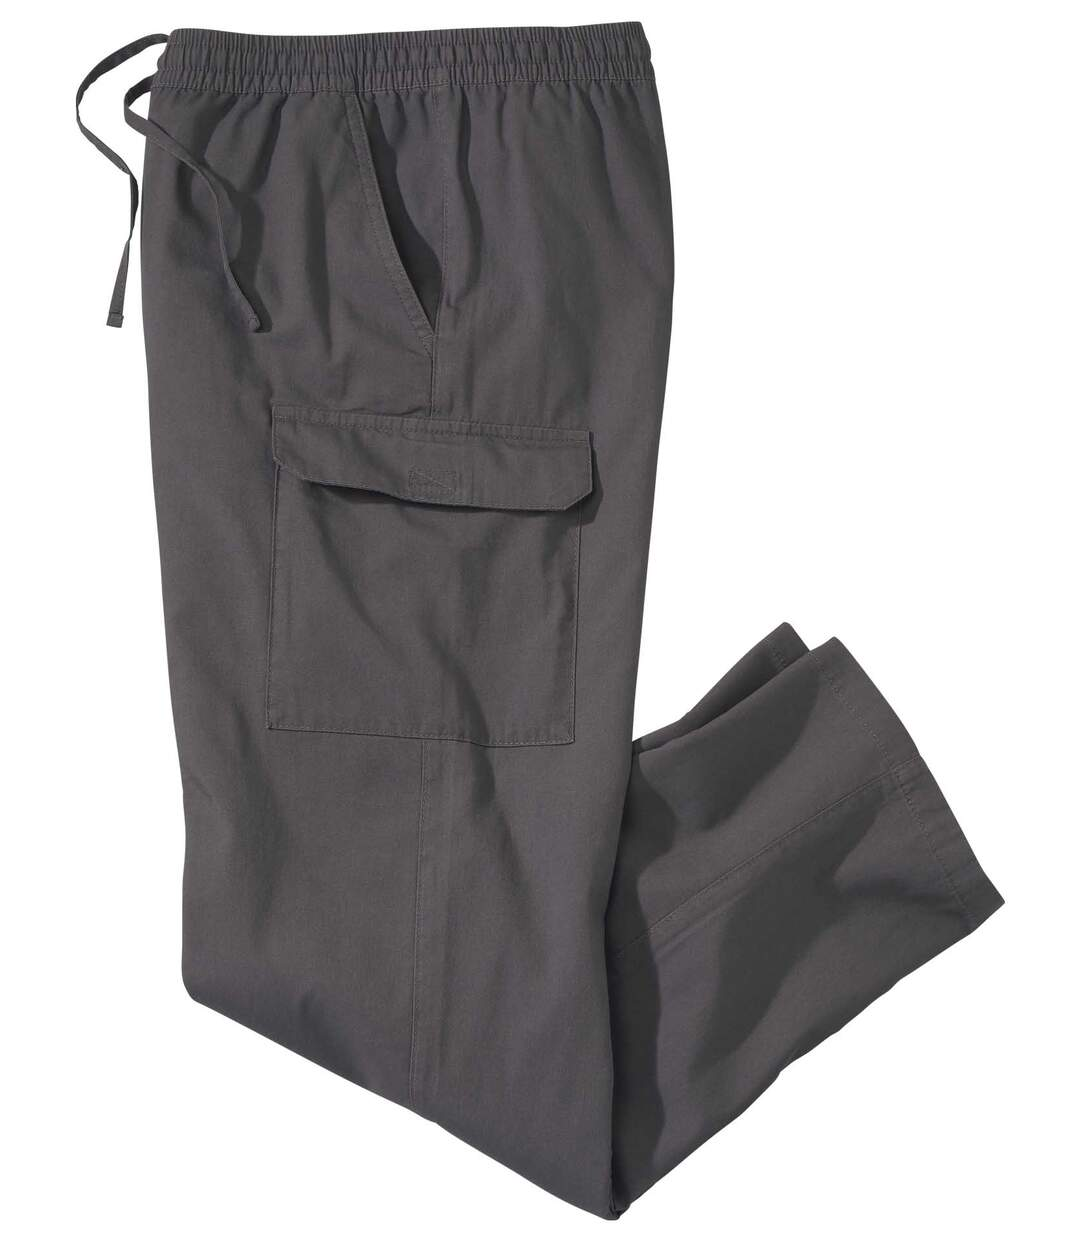 Men's Casual Cargo Trousers - Dark Grey